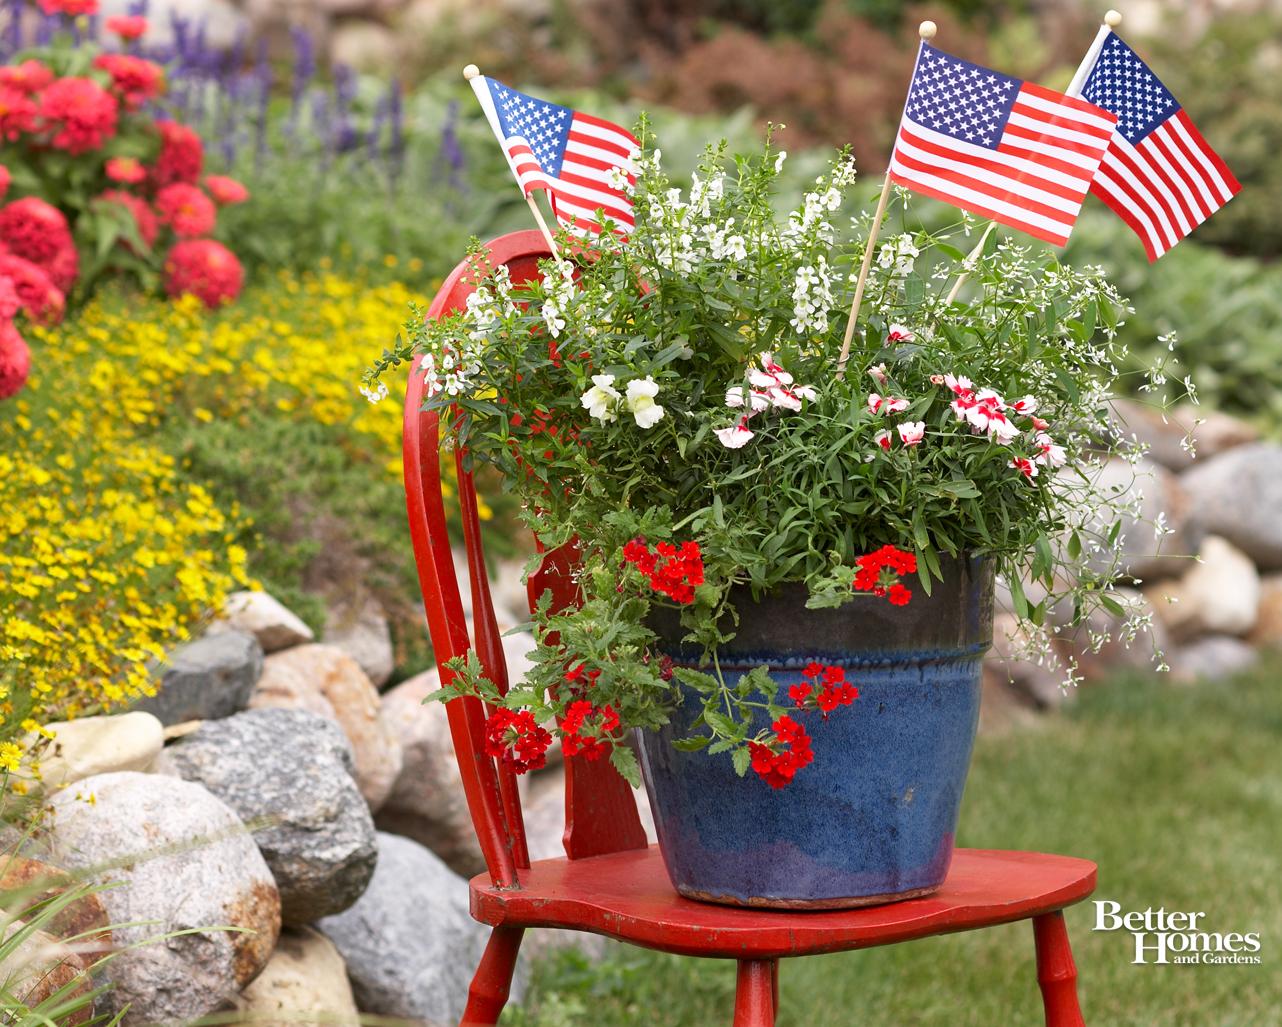 patriotic screensavers and wallpaper wallpapersafari American Flag Clip Art Animated American Flag Clip Art Black and White